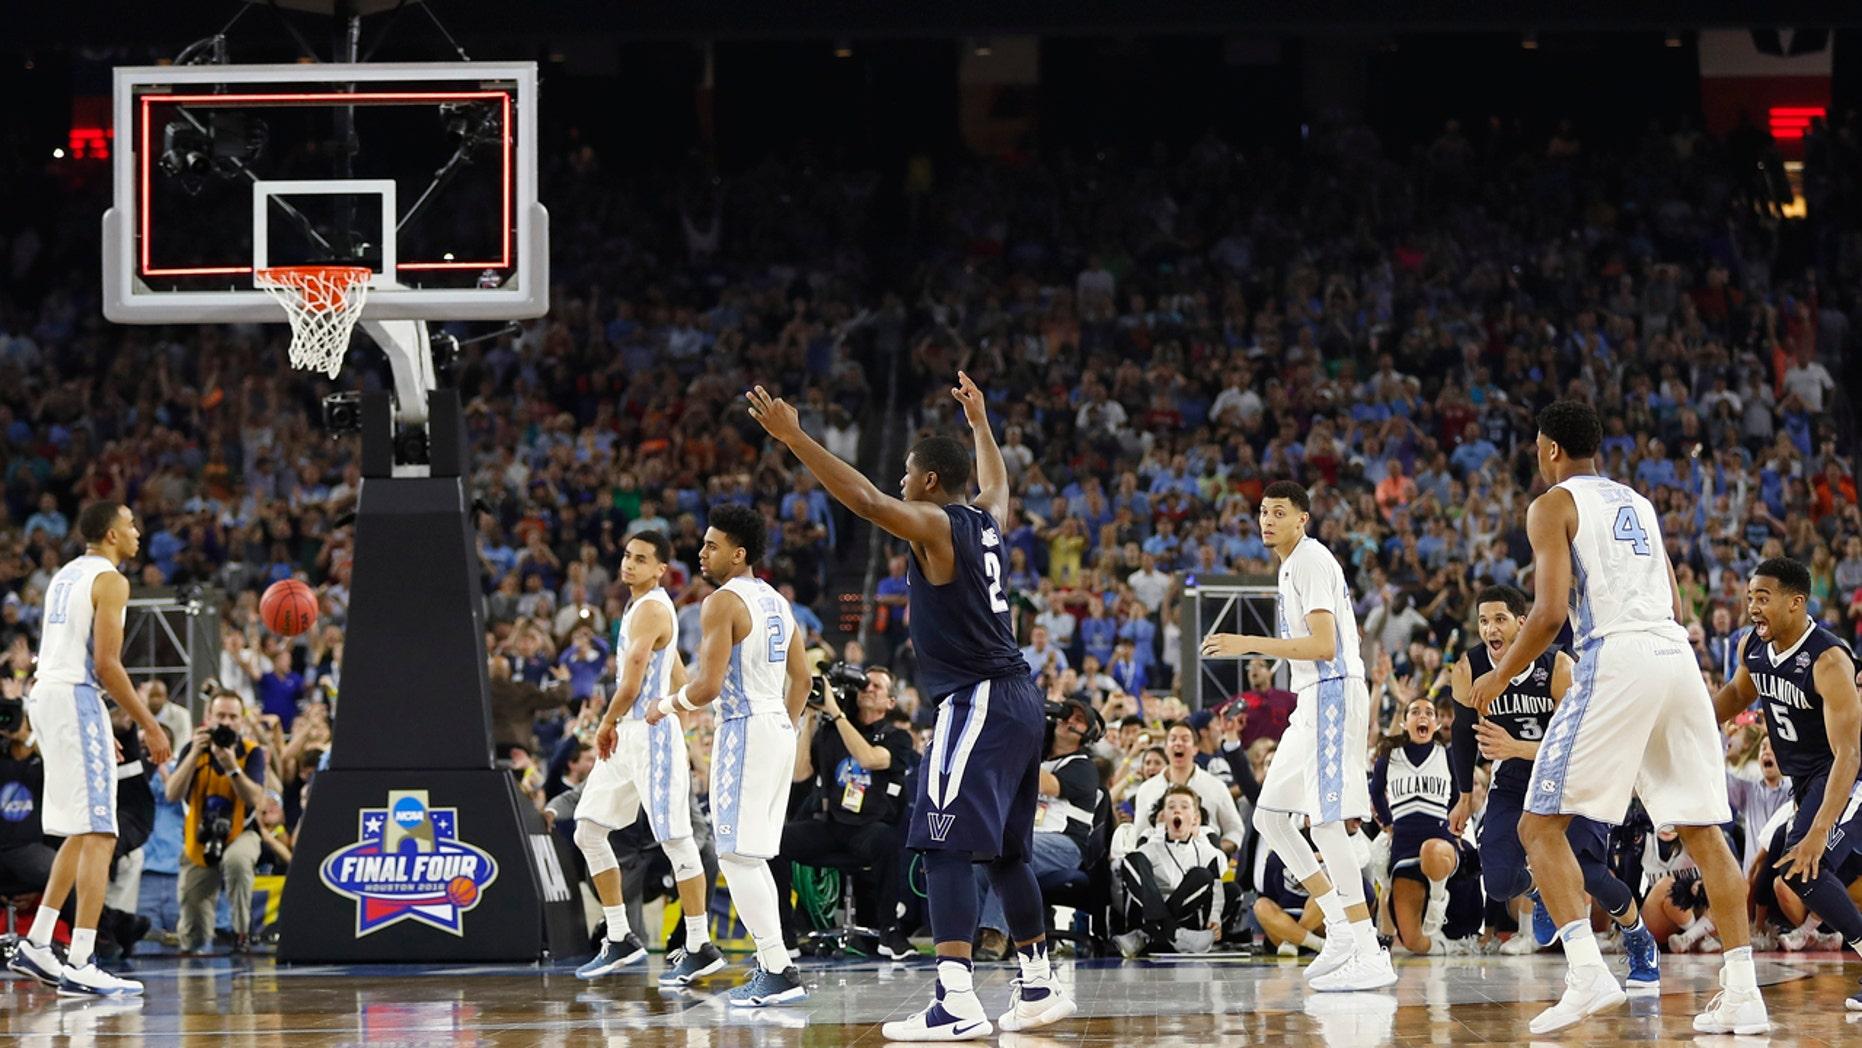 April 4, 2016: Villanova forward Kris Jenkins (2) reacts to his shot at the end of the NCAA men's college basketball championship game against North Carolina